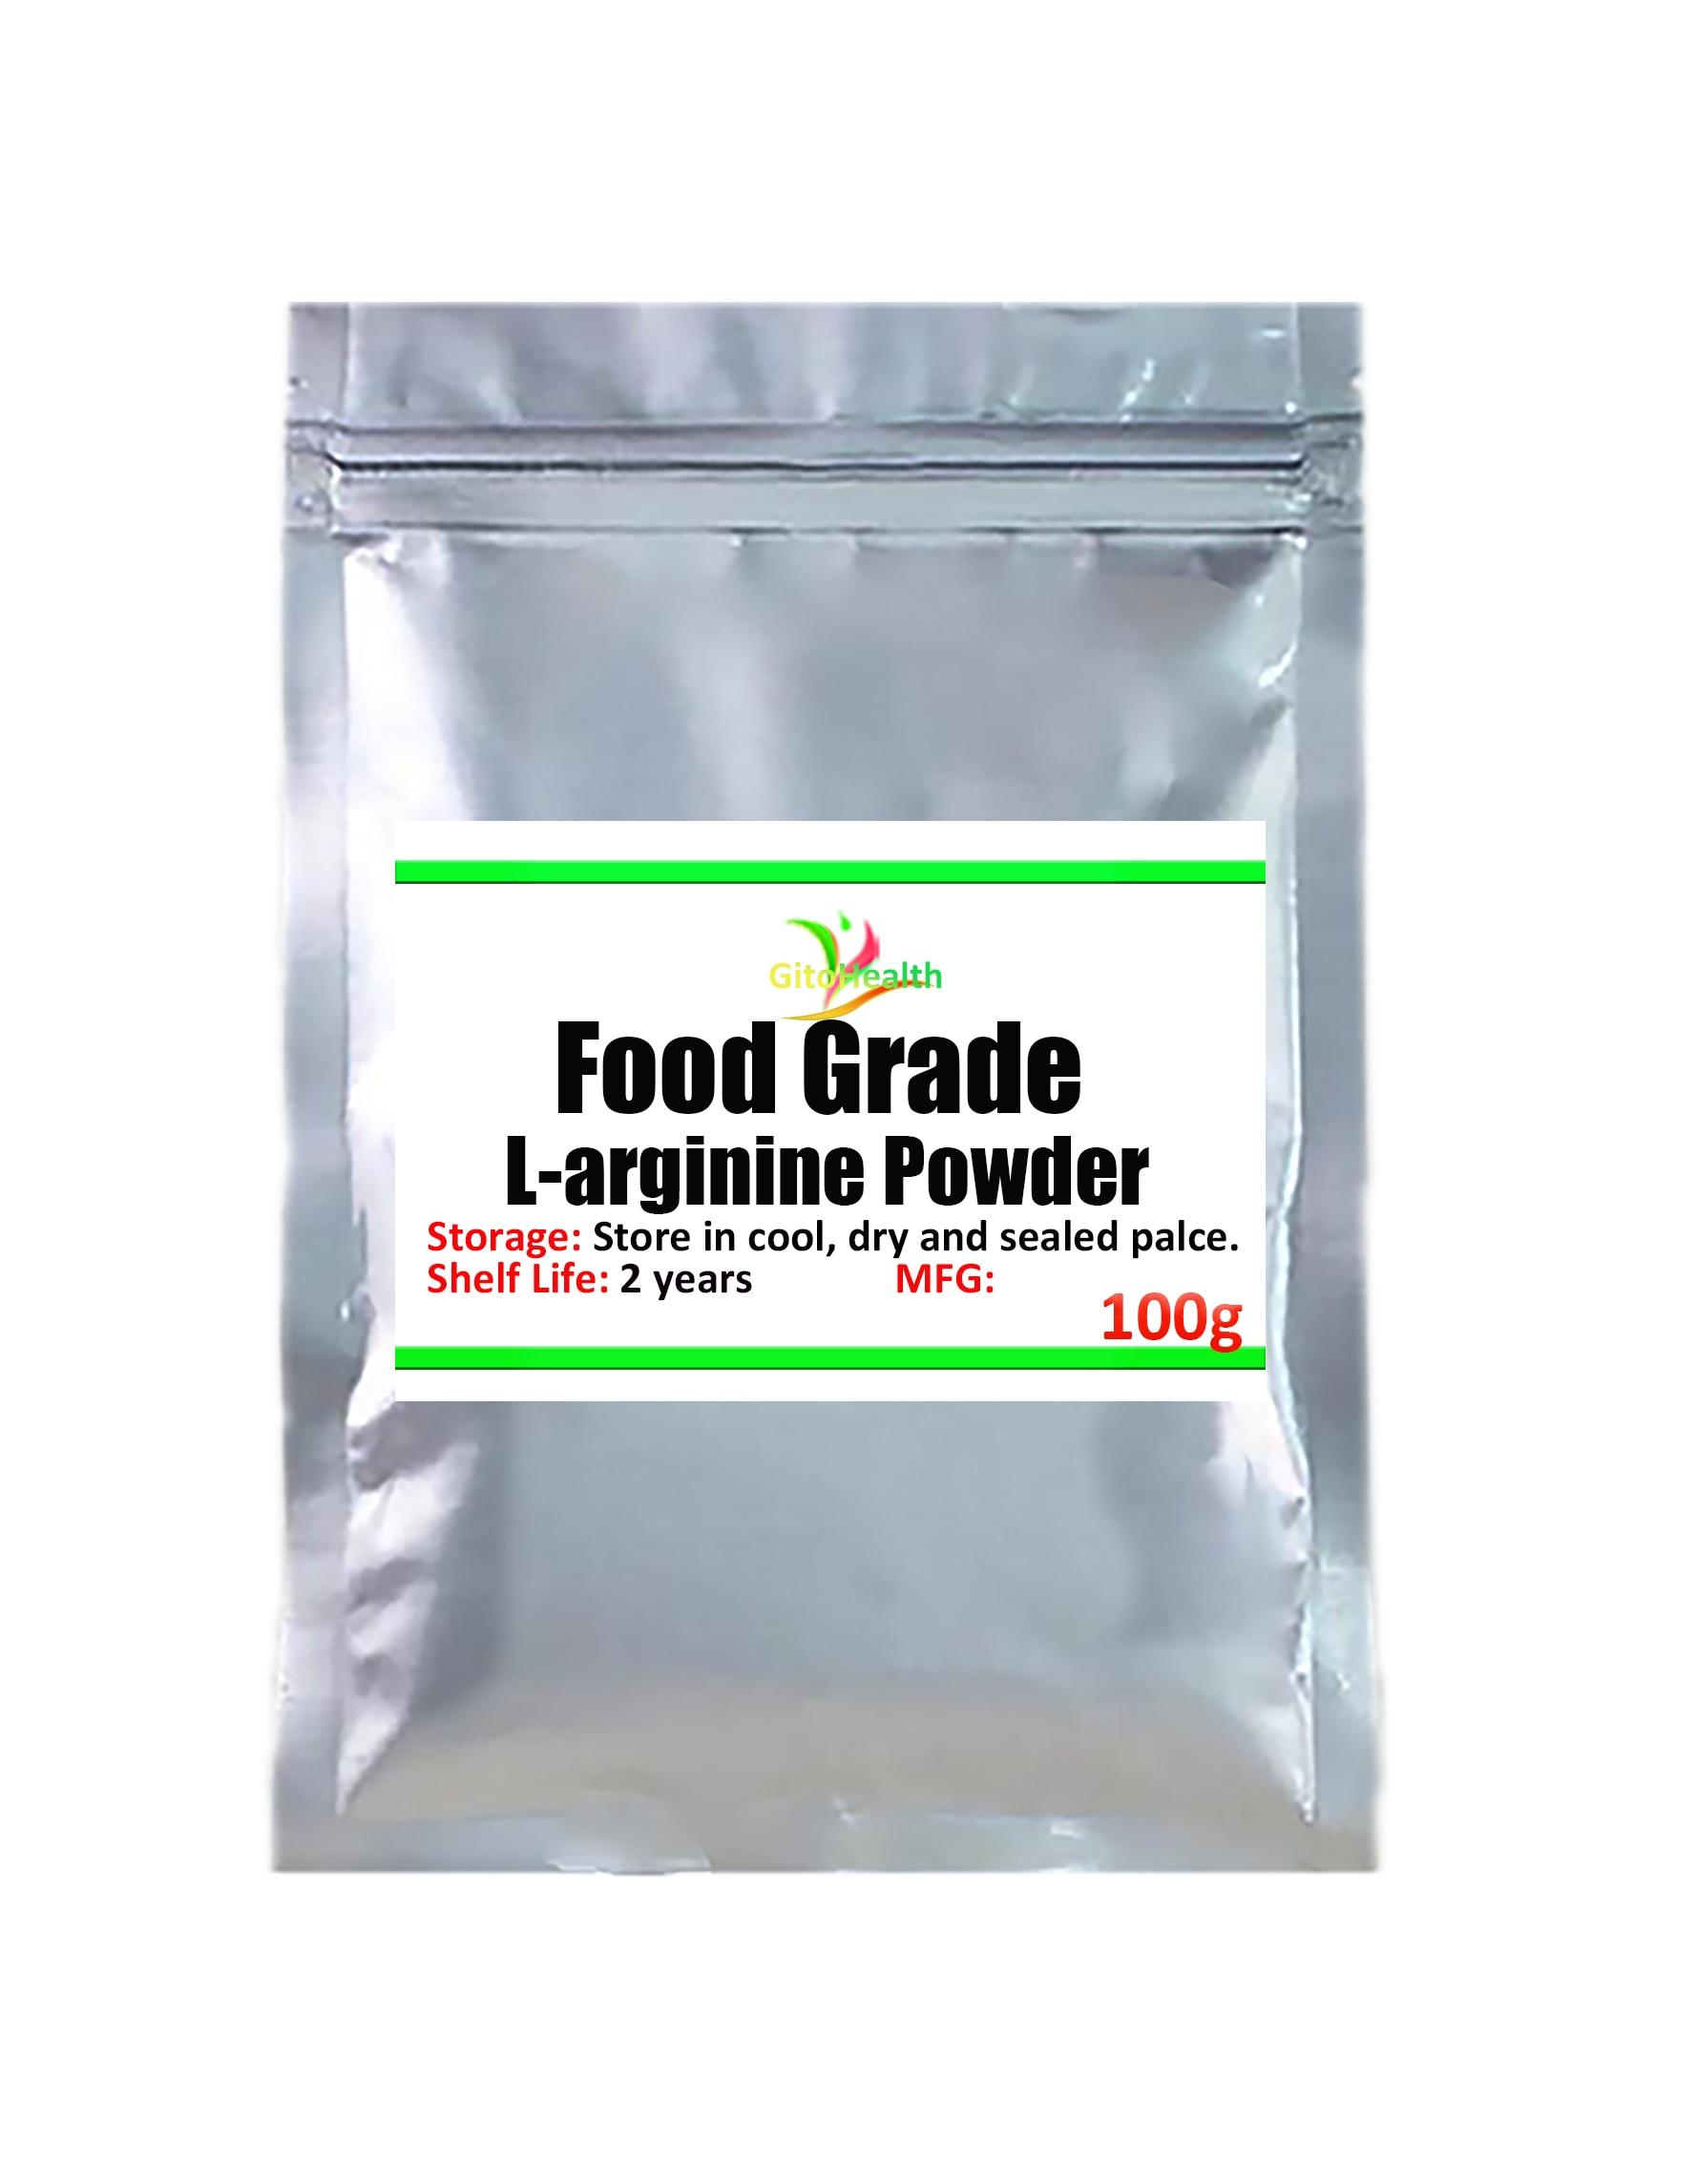 50g-1000g food grade high purity. L-arginine powder, L-arginine powder, essential amino acid nutritional supplements. Promote th